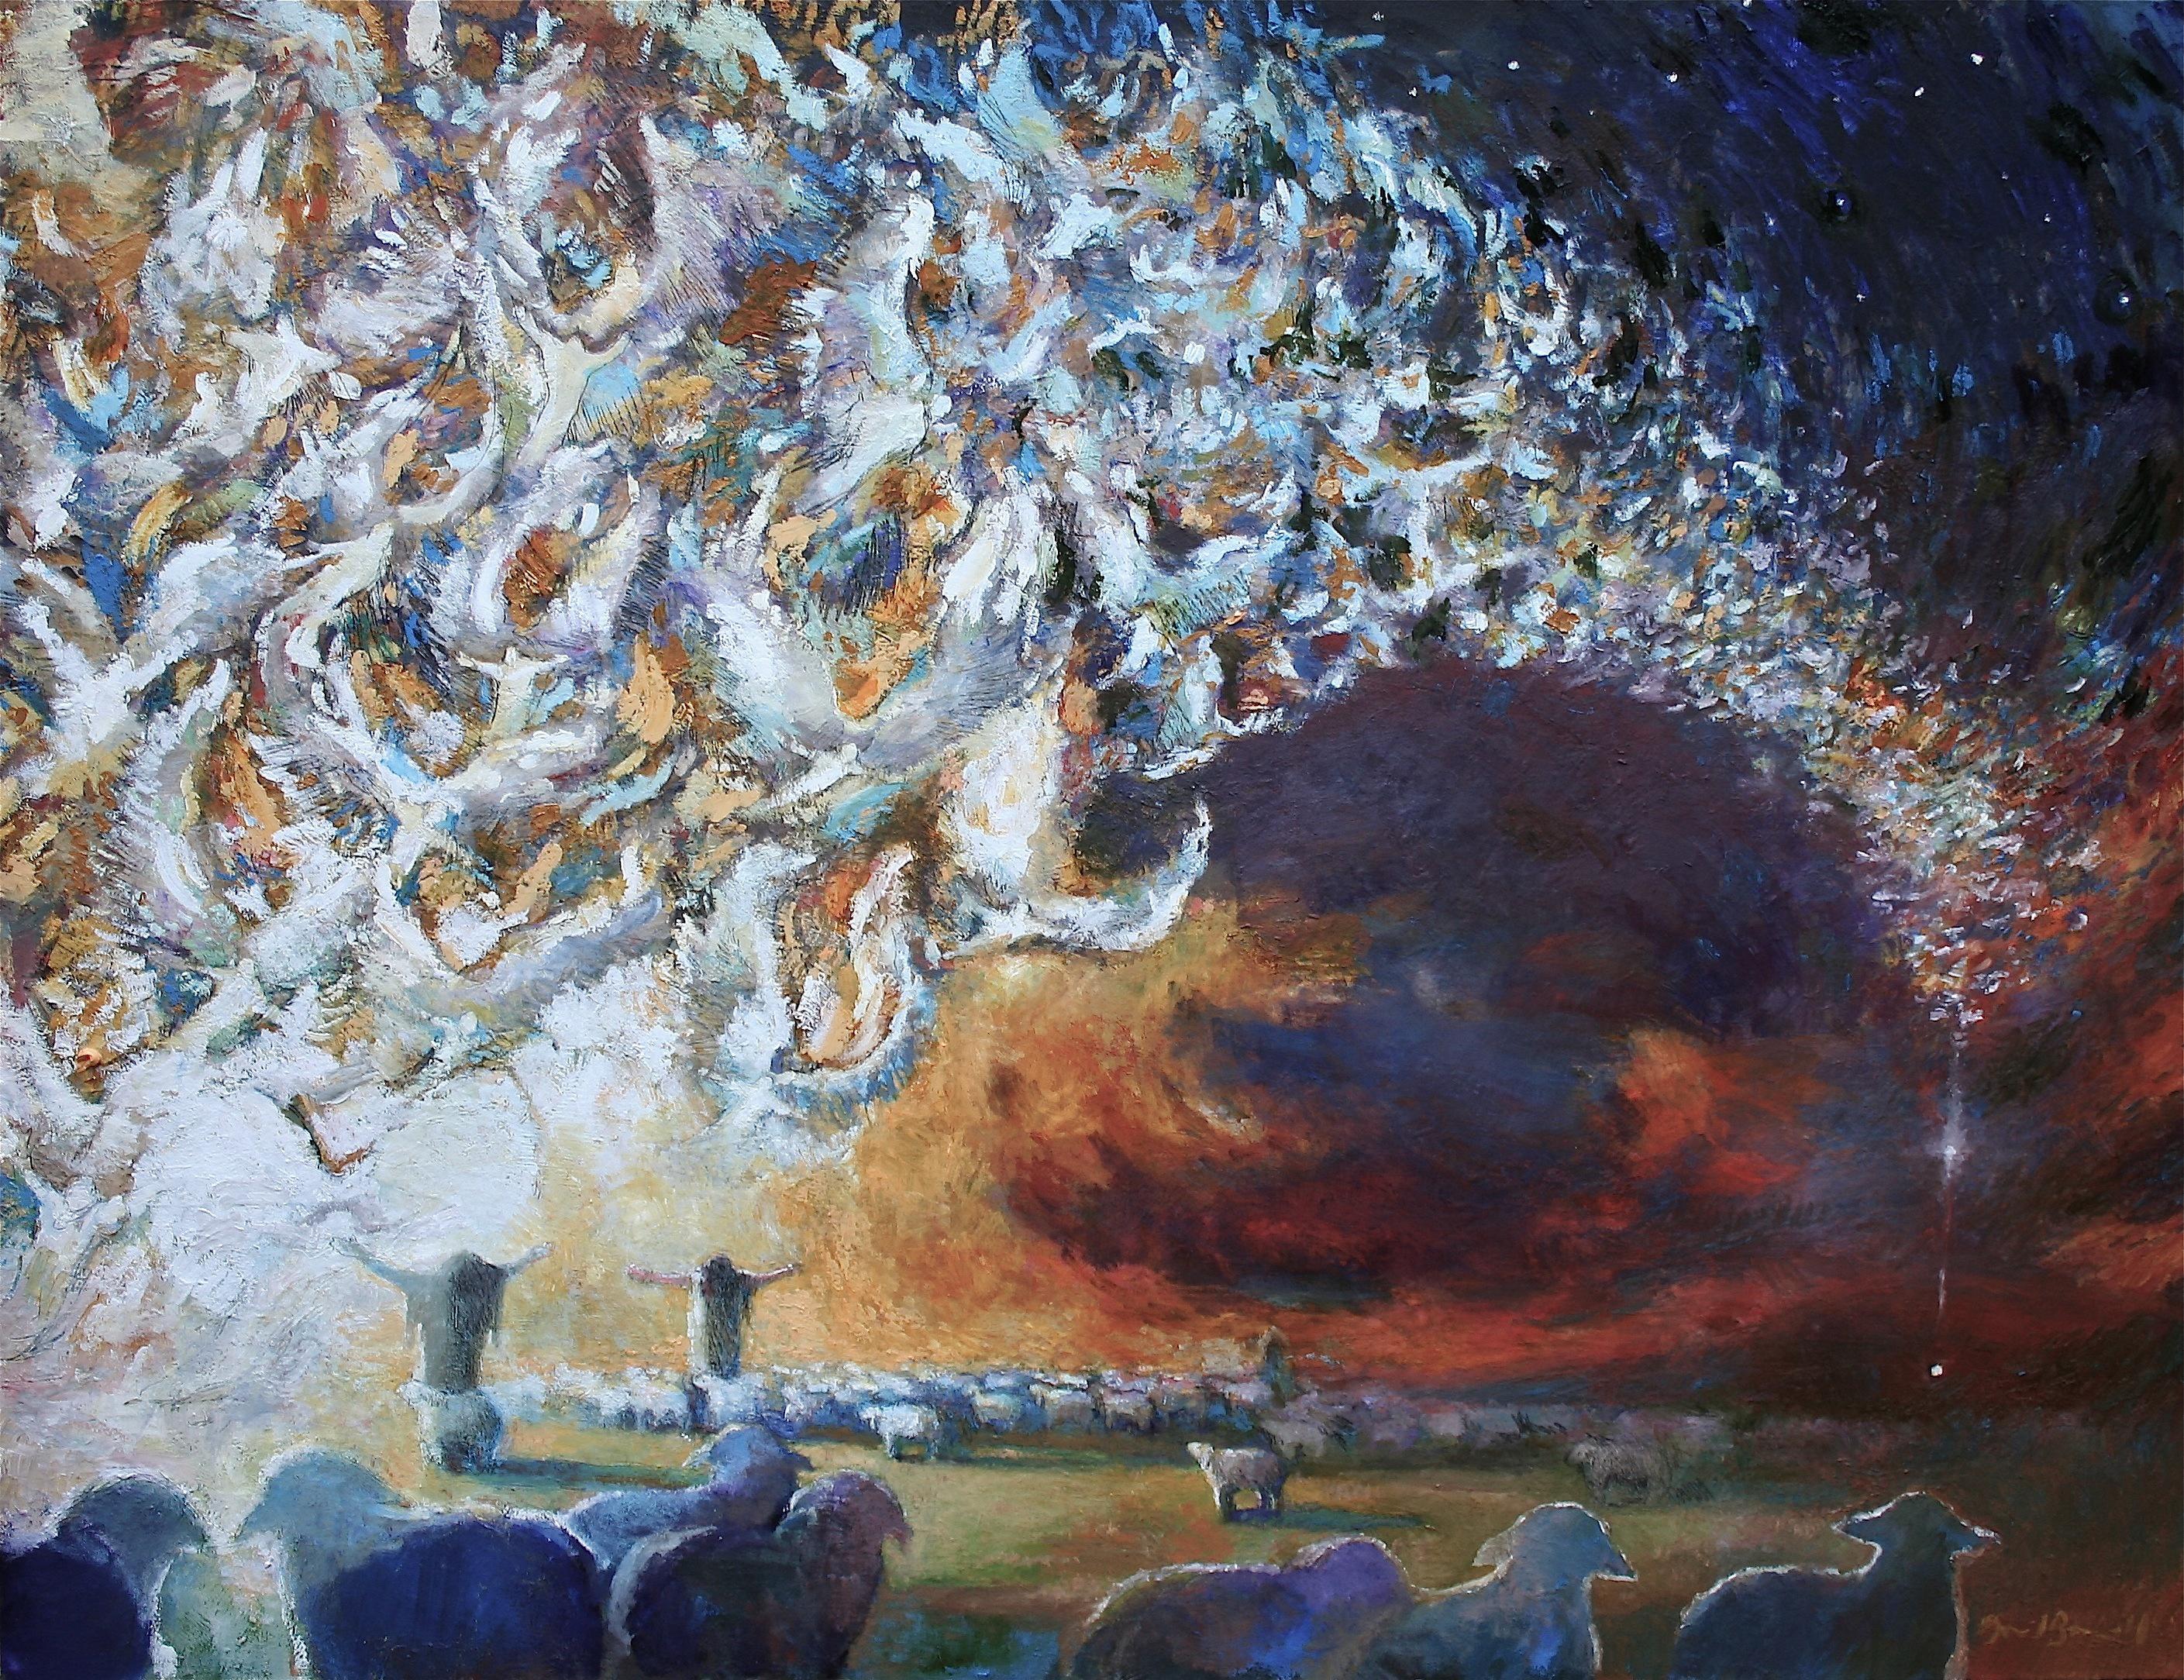 painting by Daniel Bonnellwww.bonnellart.com